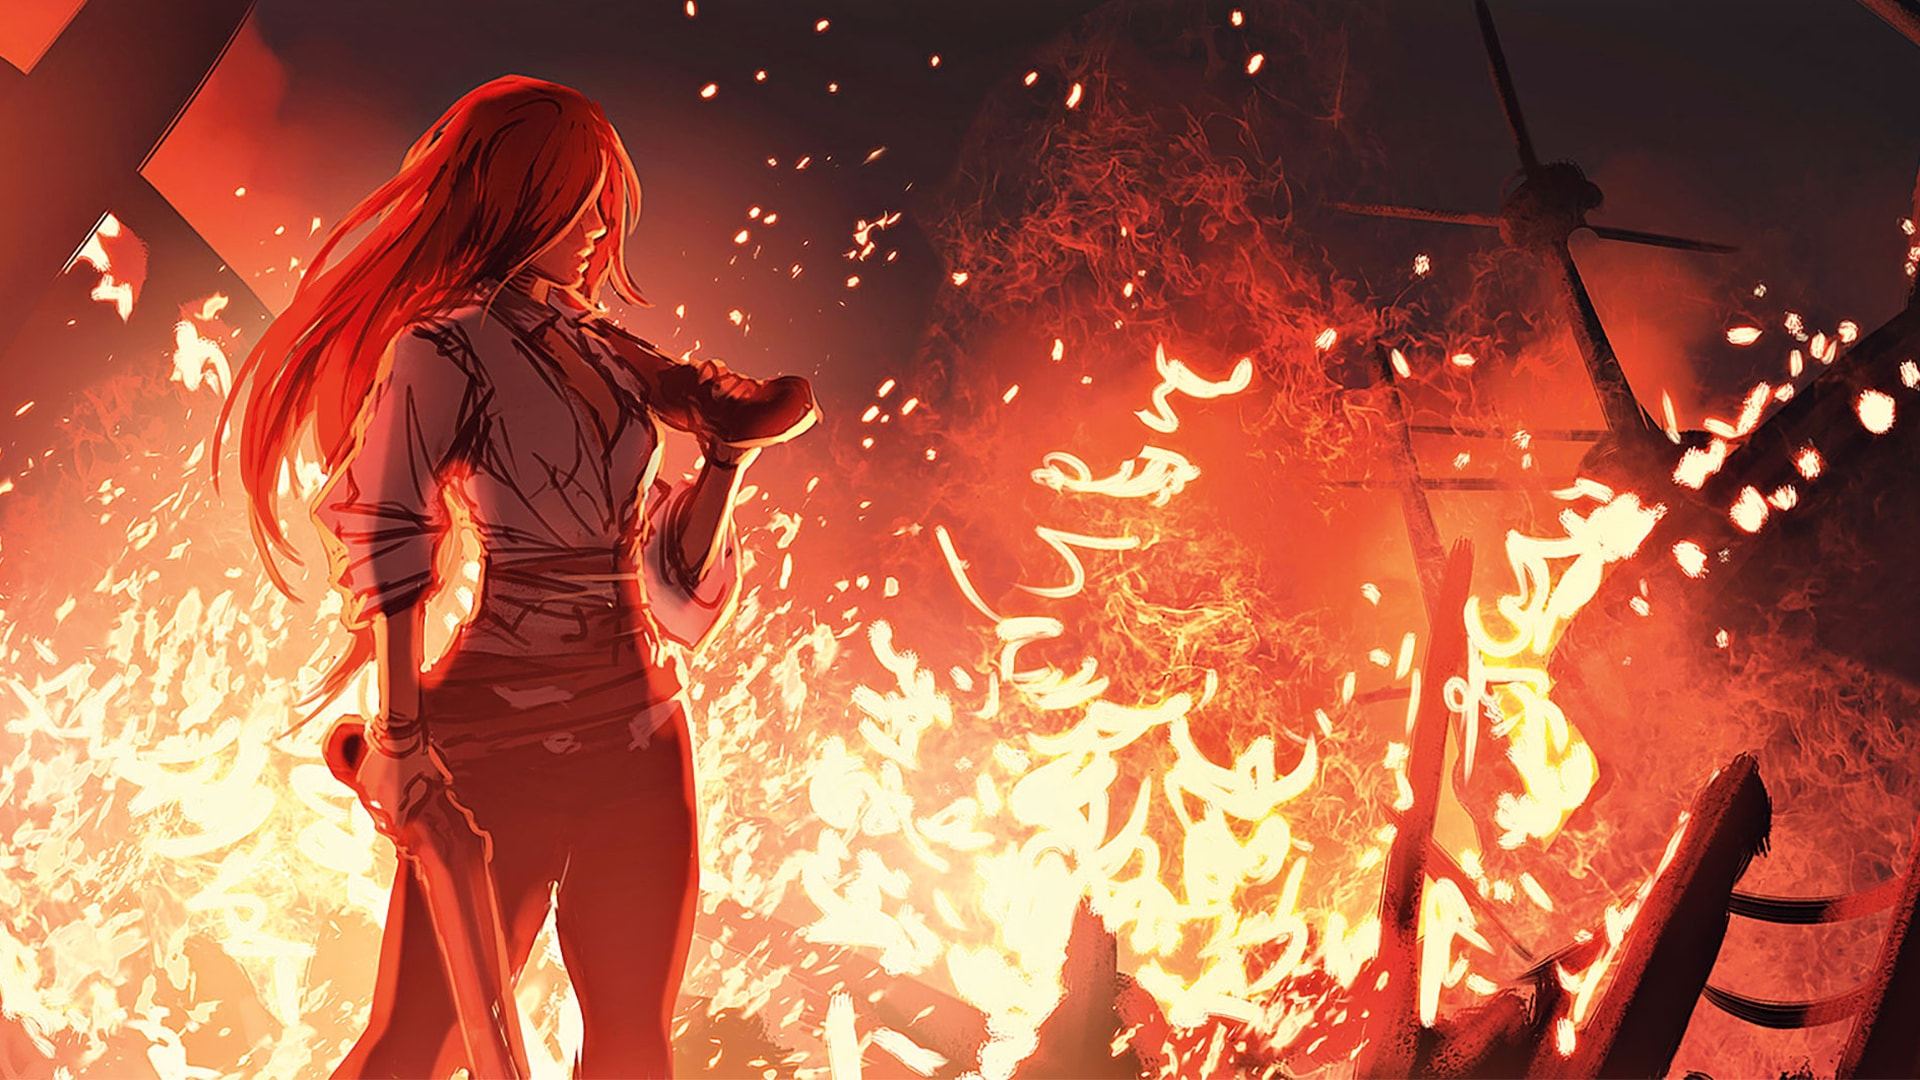 Anime girls record of agarest war 2 true end walkthrough part 032 super ecchi milking aina sexy - 5 5